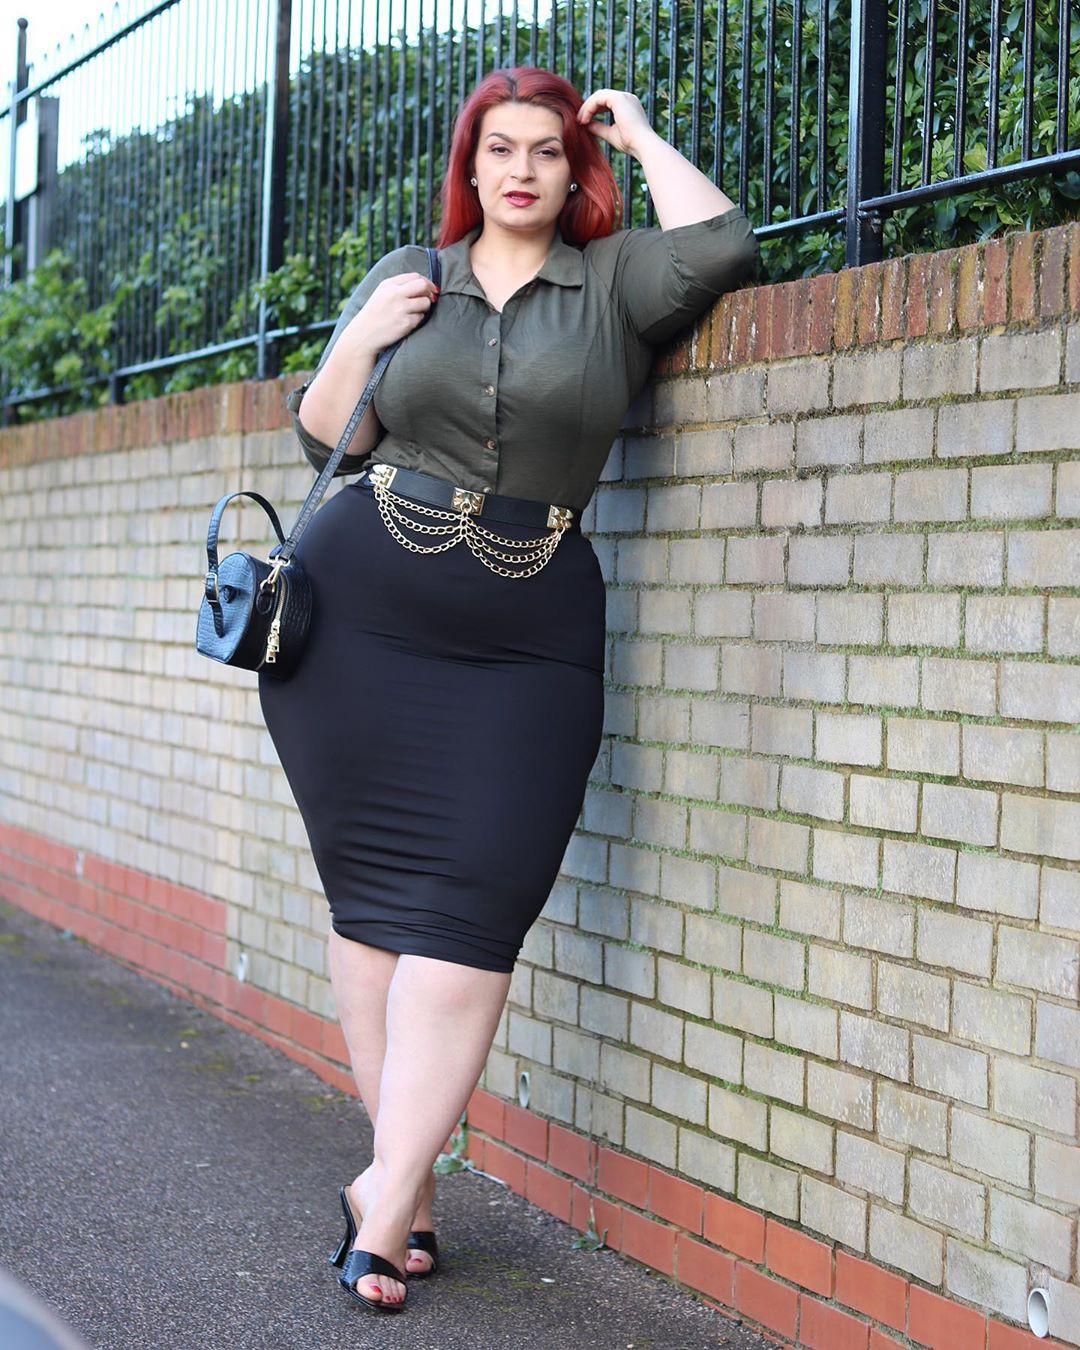 Ioana Chira dress little black dress, pencil skirt clothing ideas